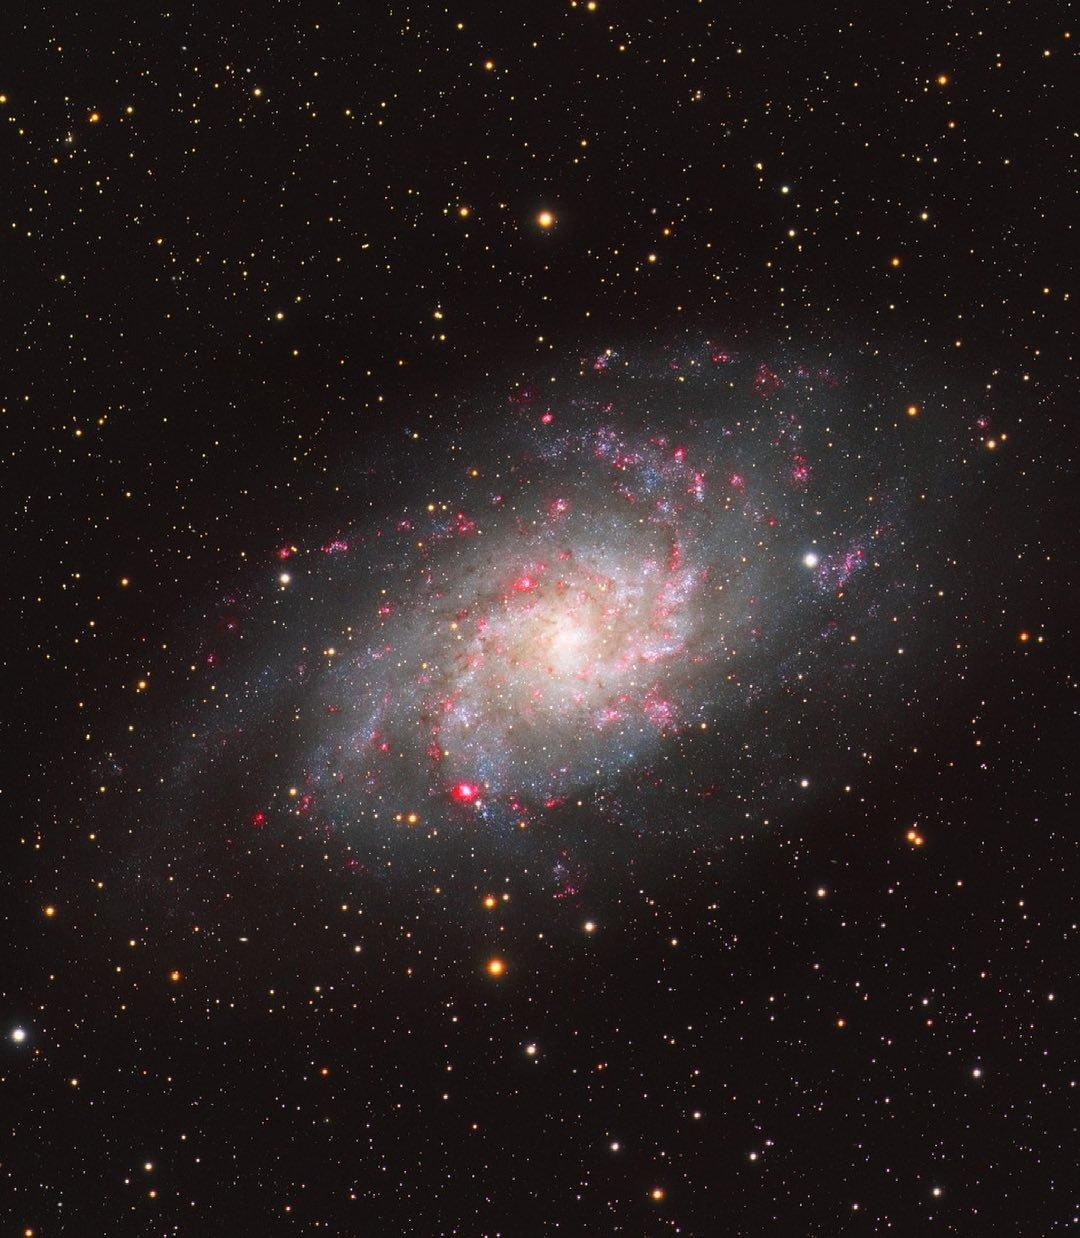 Галактика Треугольника. Фото — Бенджамин Чизи.